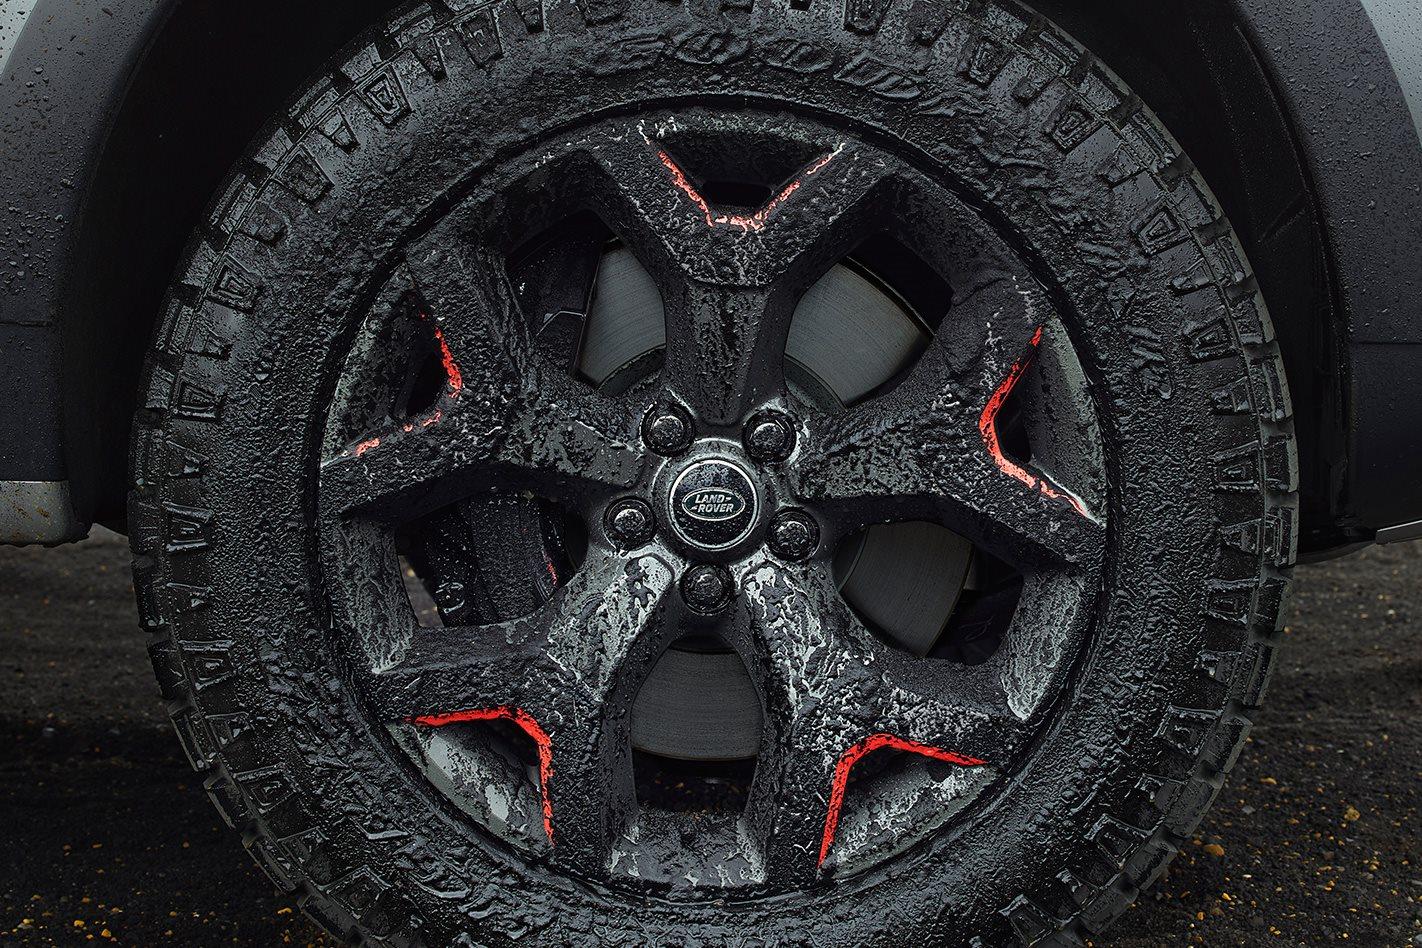 Land-Rover-Discovery-SVX-wheel.jpg